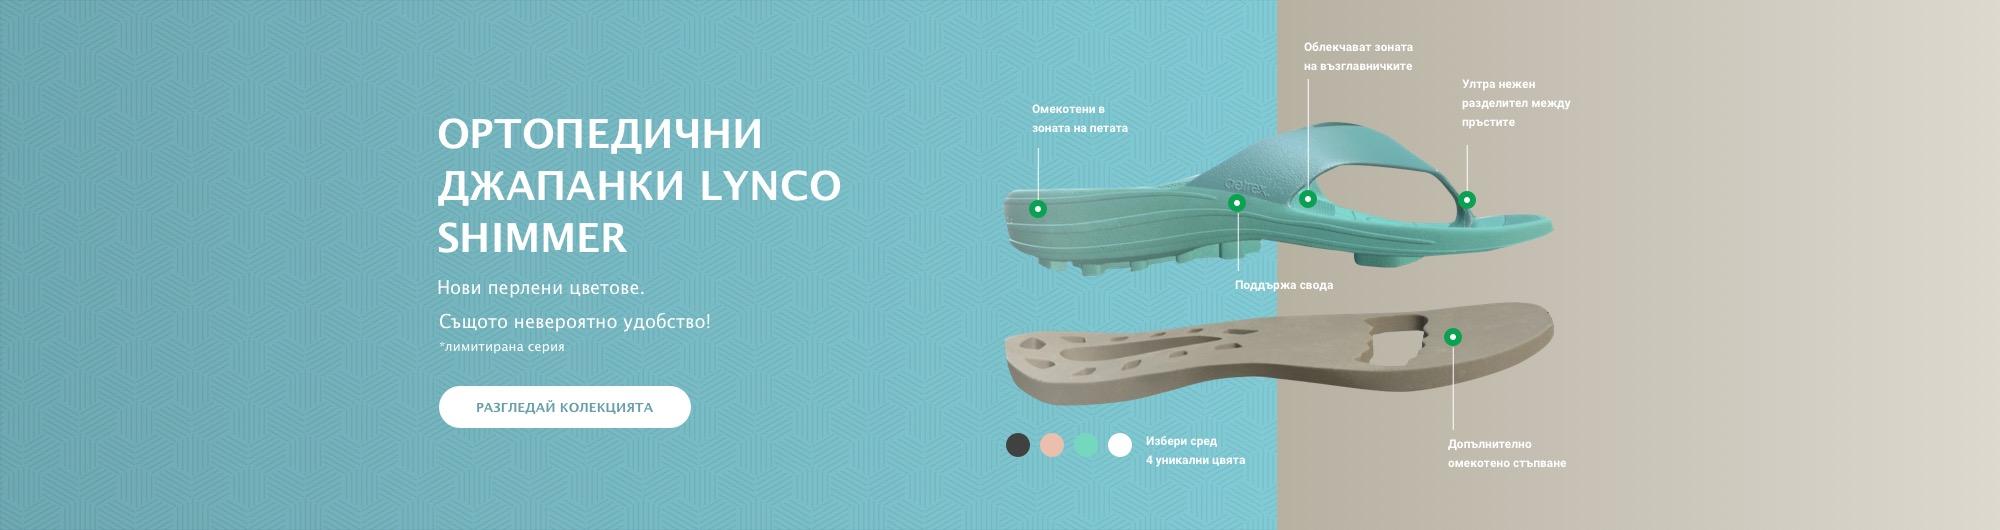 ортопедични джапанки Lynco